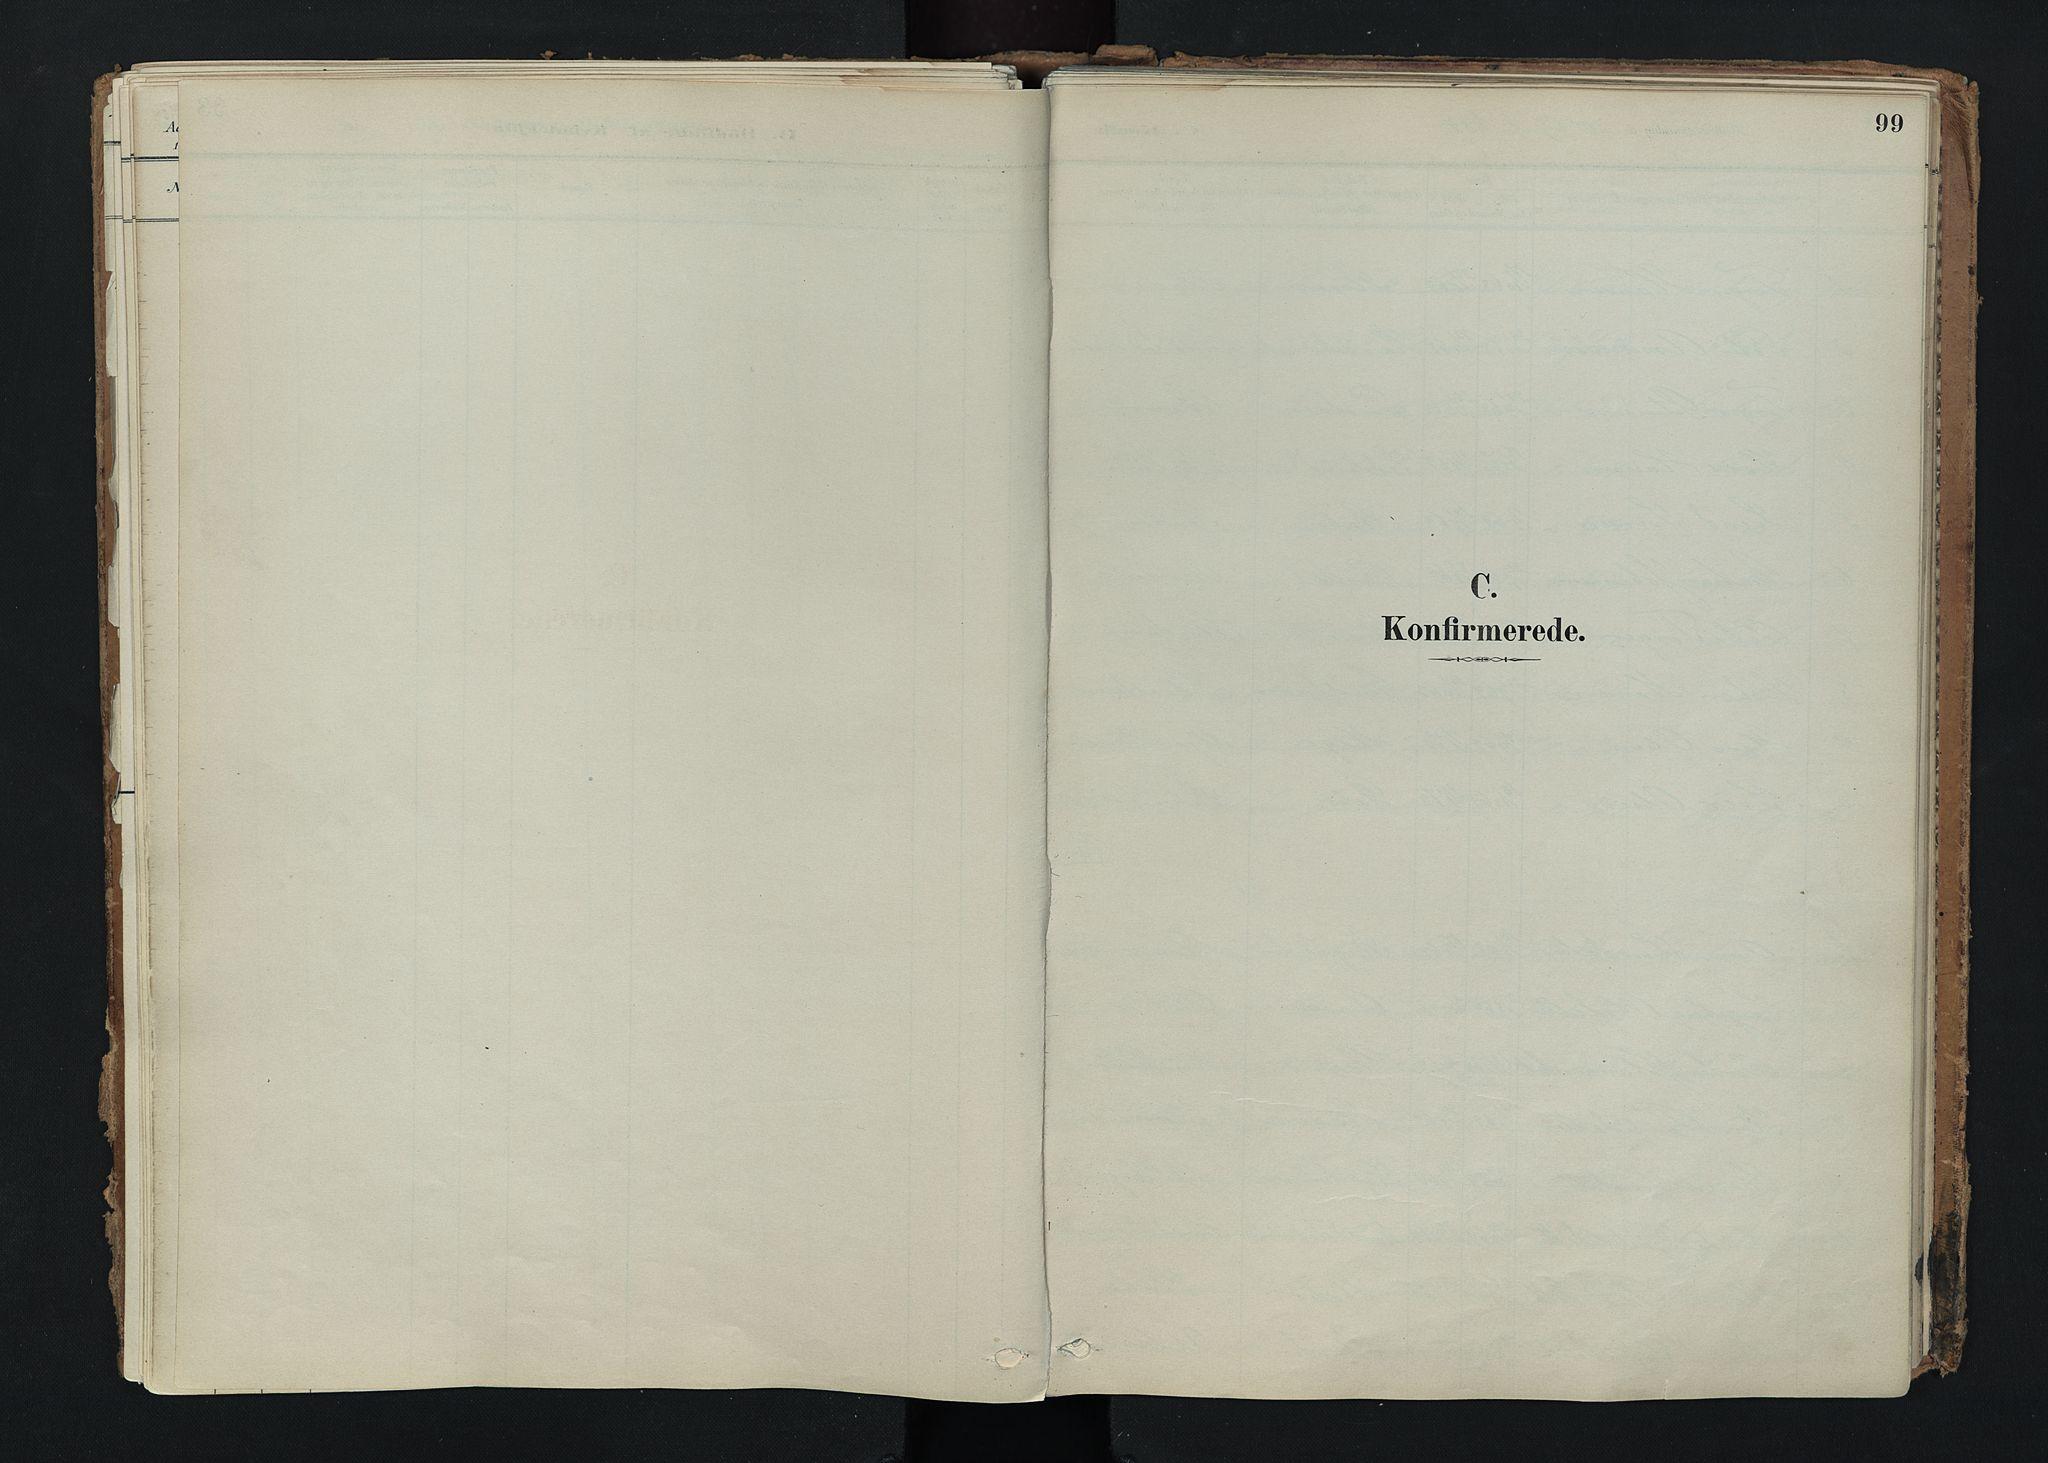 SAH, Nord-Fron prestekontor, Ministerialbok nr. 5, 1884-1914, s. 99